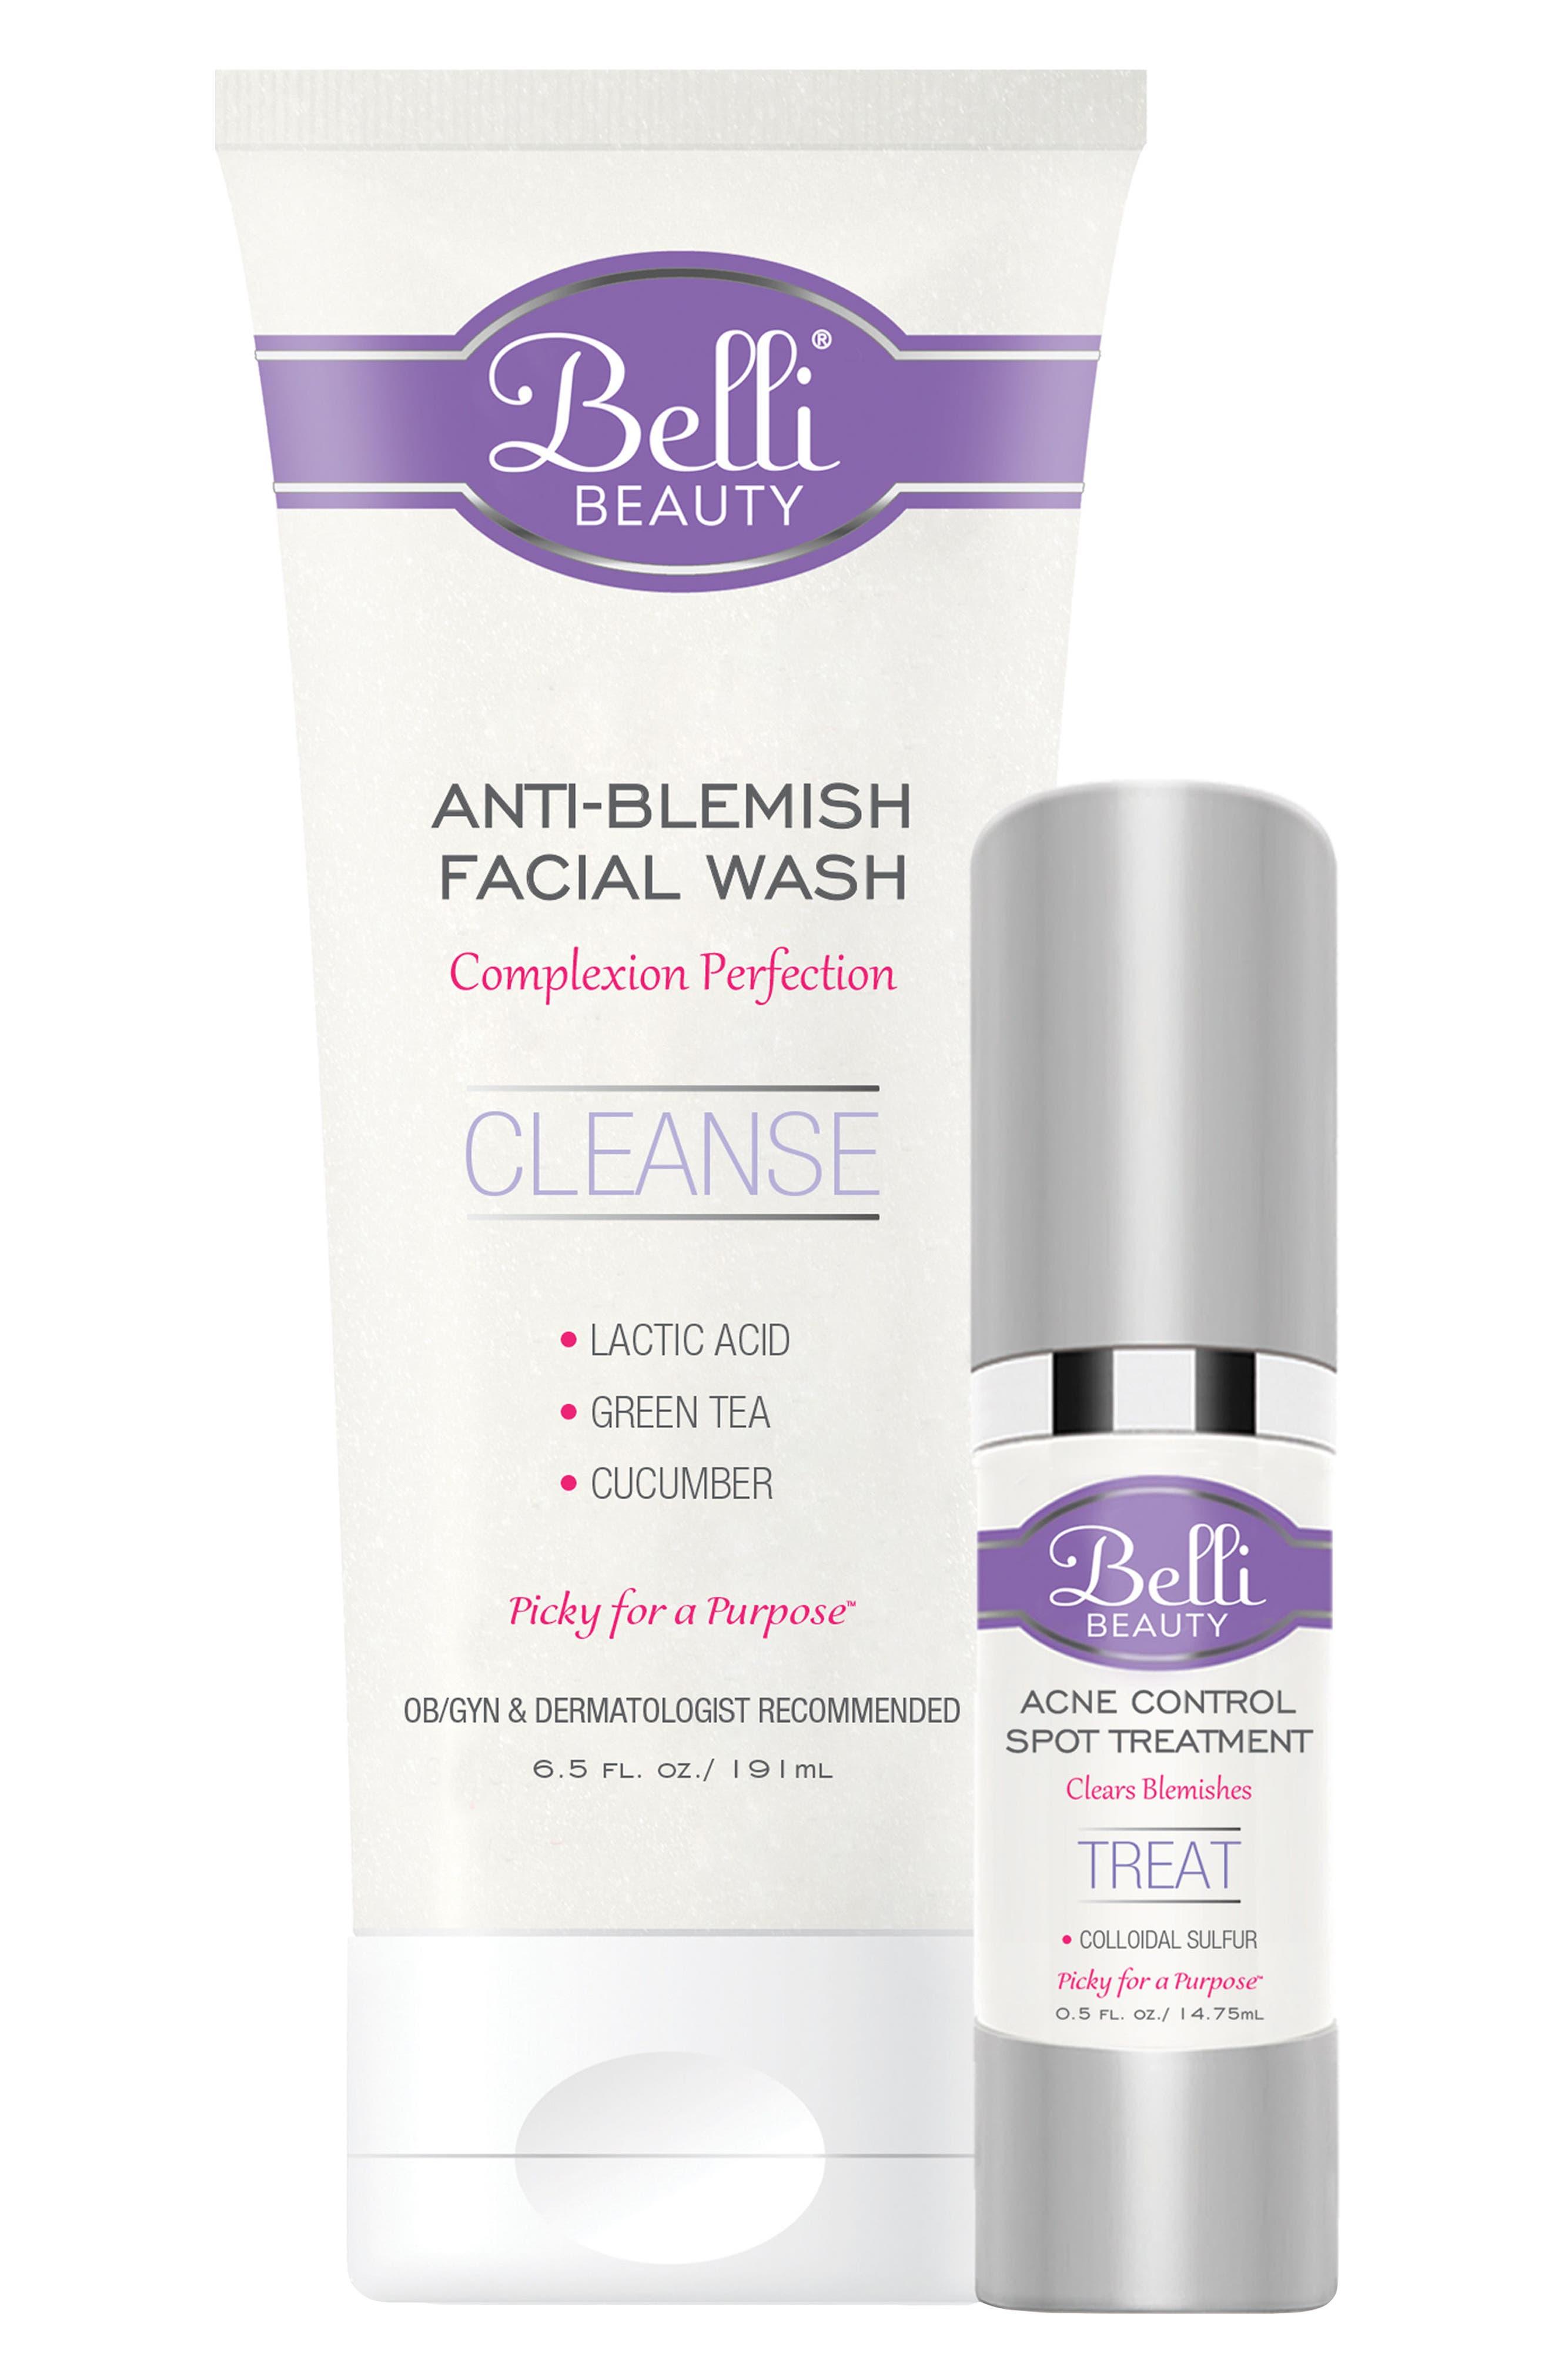 Alternate Image 1 Selected - Belli Skincare Maternity Anti-Blemish Basics with Anti-Blemish Facial Wash (6.5 oz.) & Acne Control Spot Treatment (1.5 oz.)